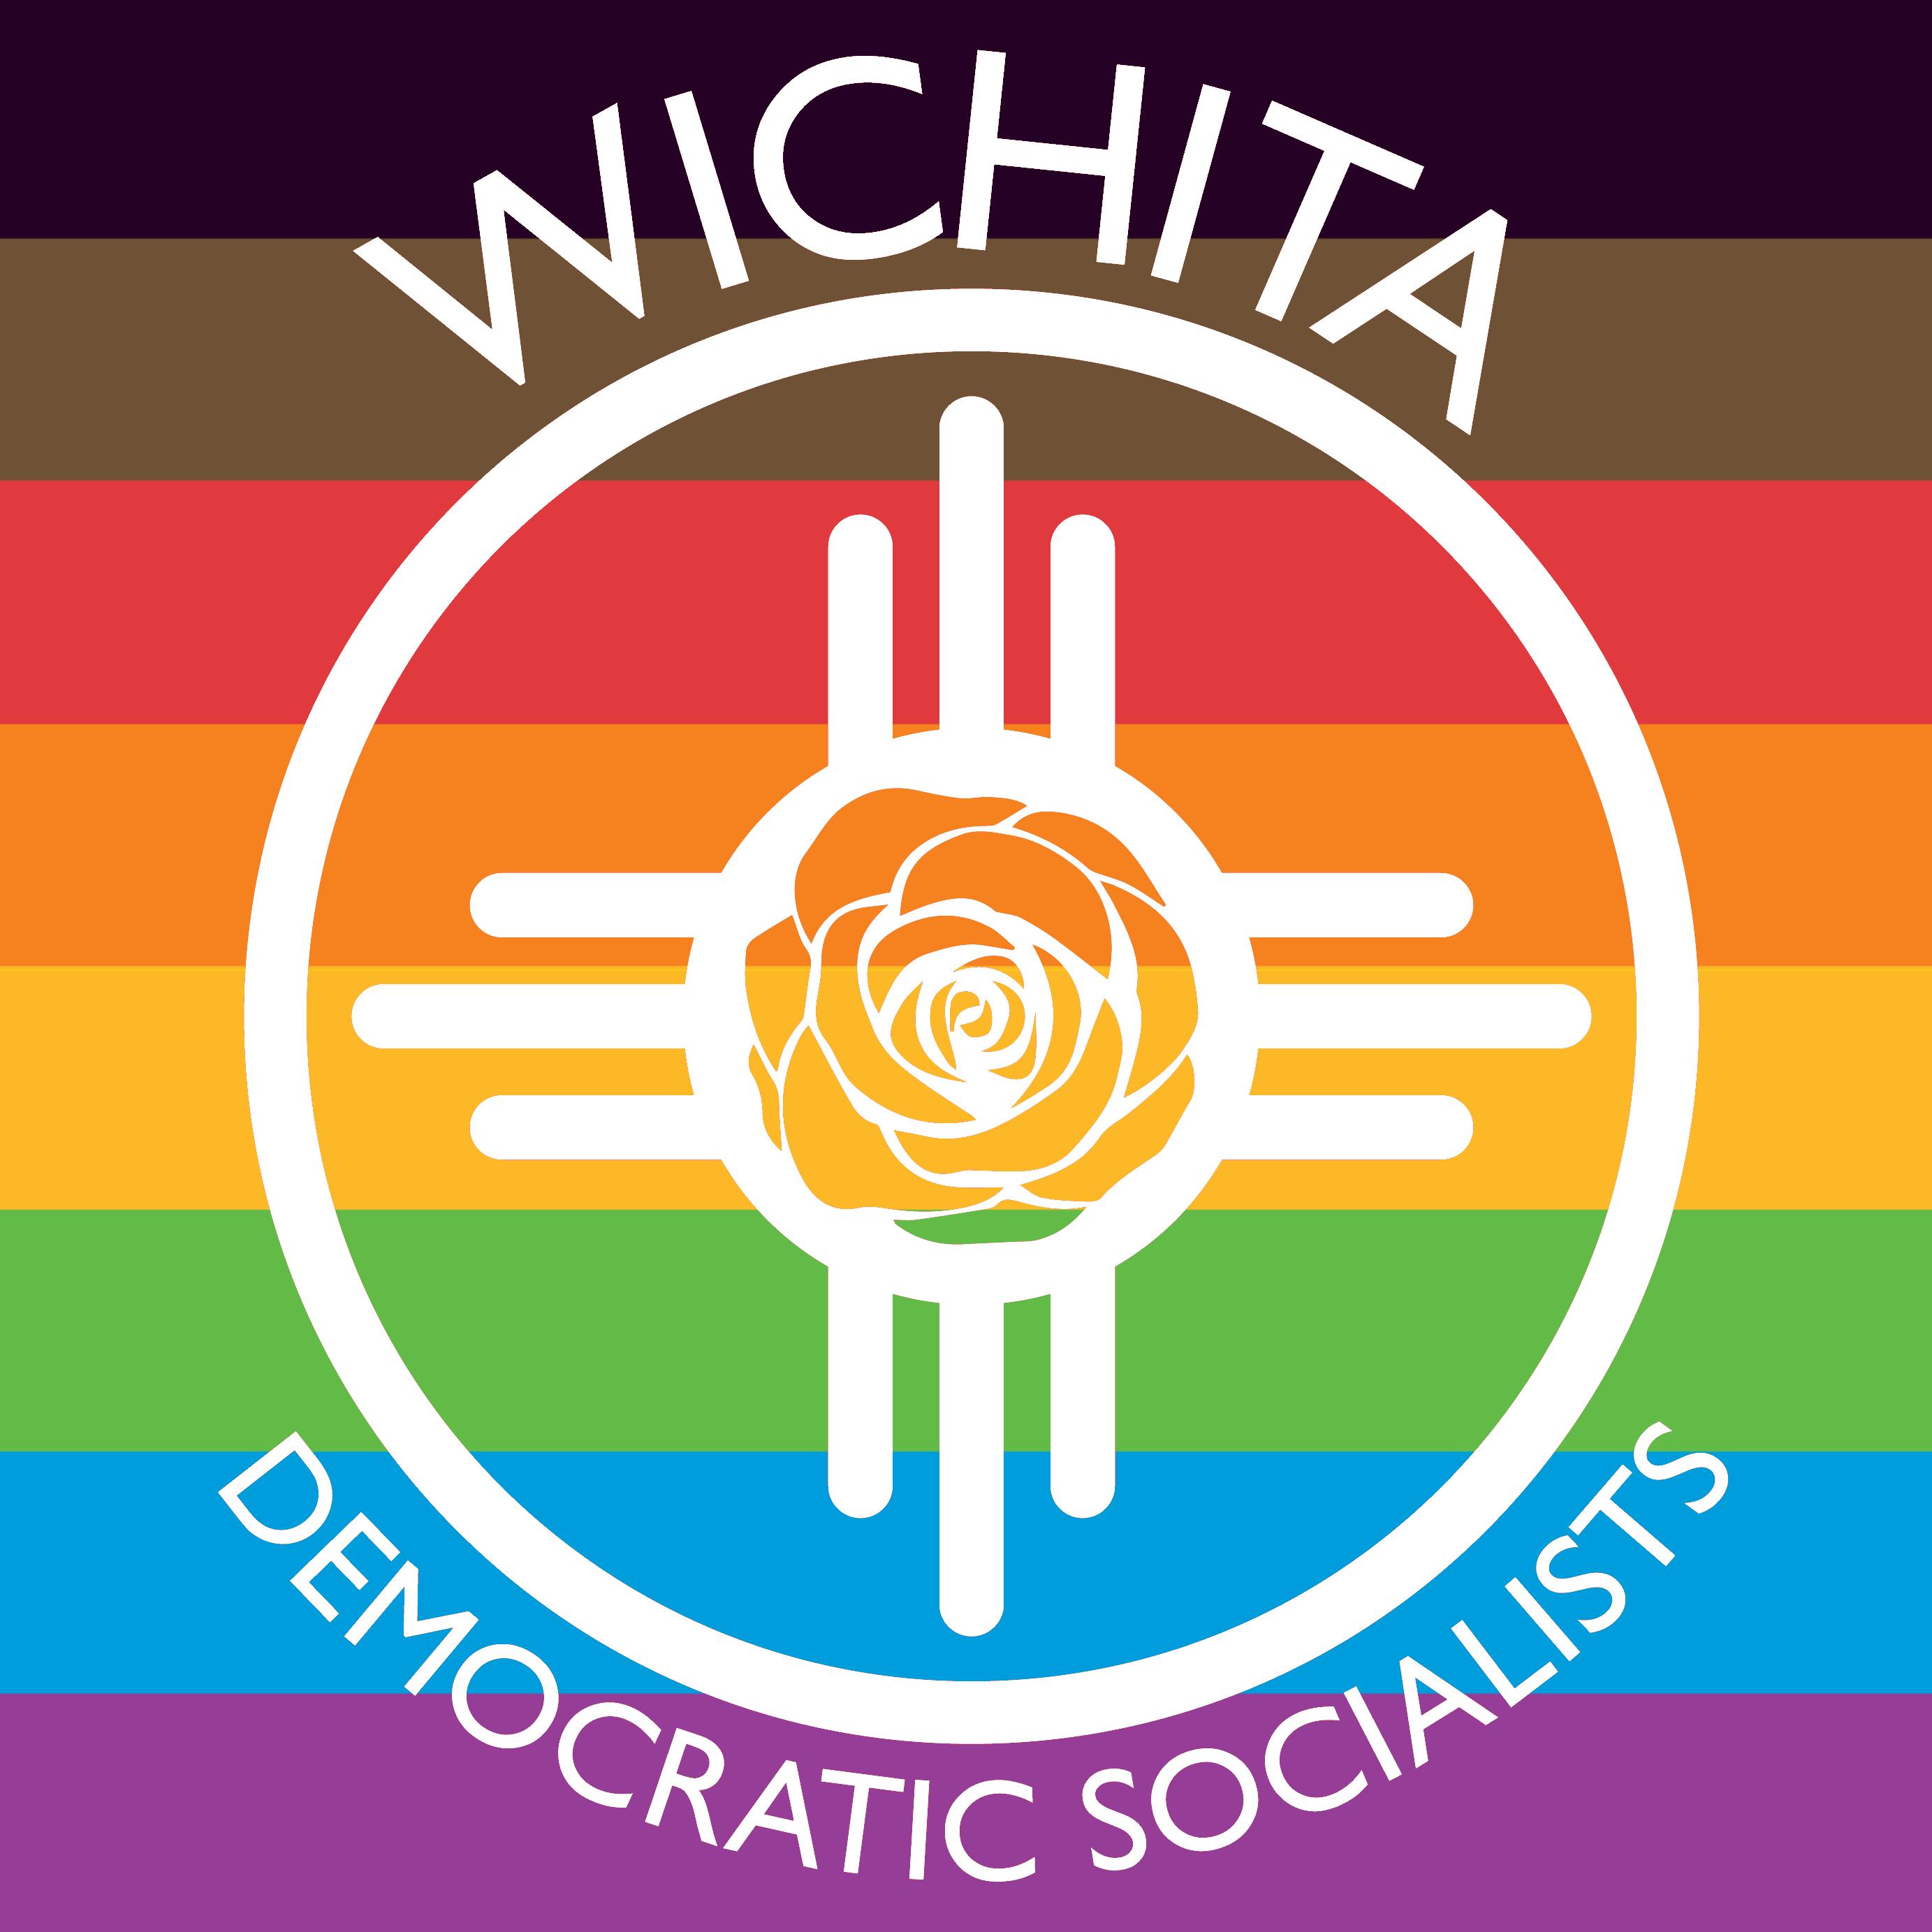 Wichita_dsa_pride